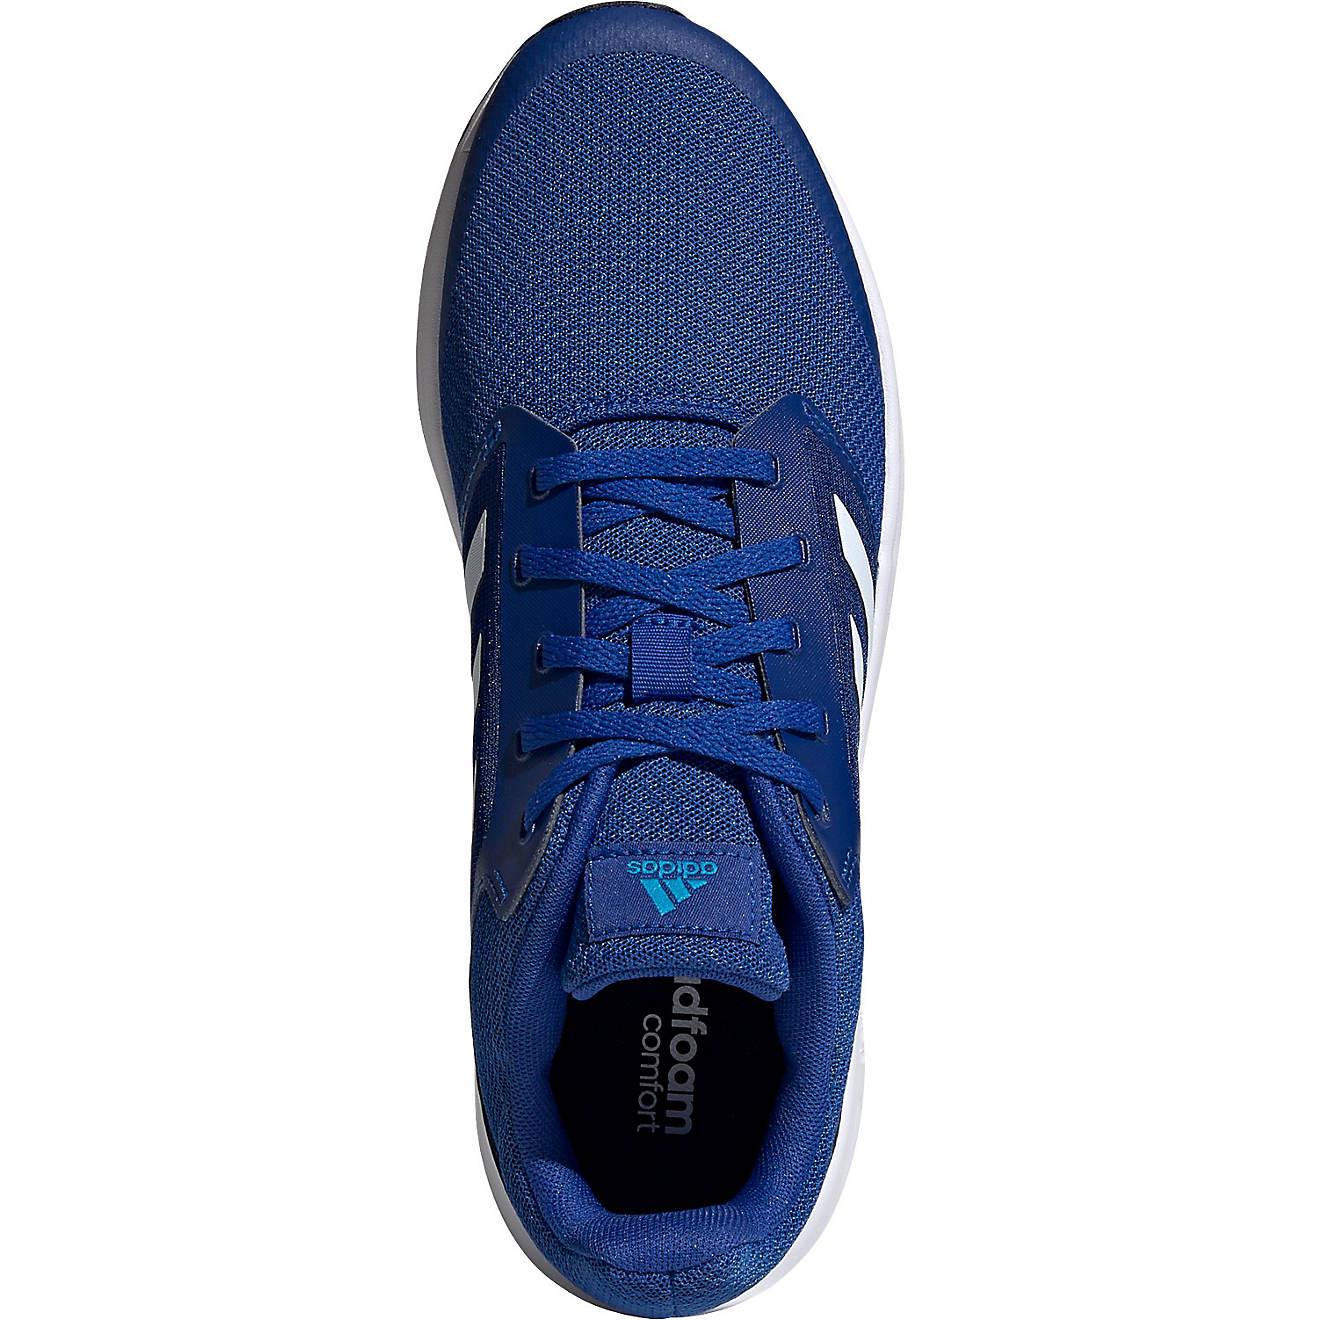 .99 adidas Men's Galaxy 5 Running Shoes at Academy!